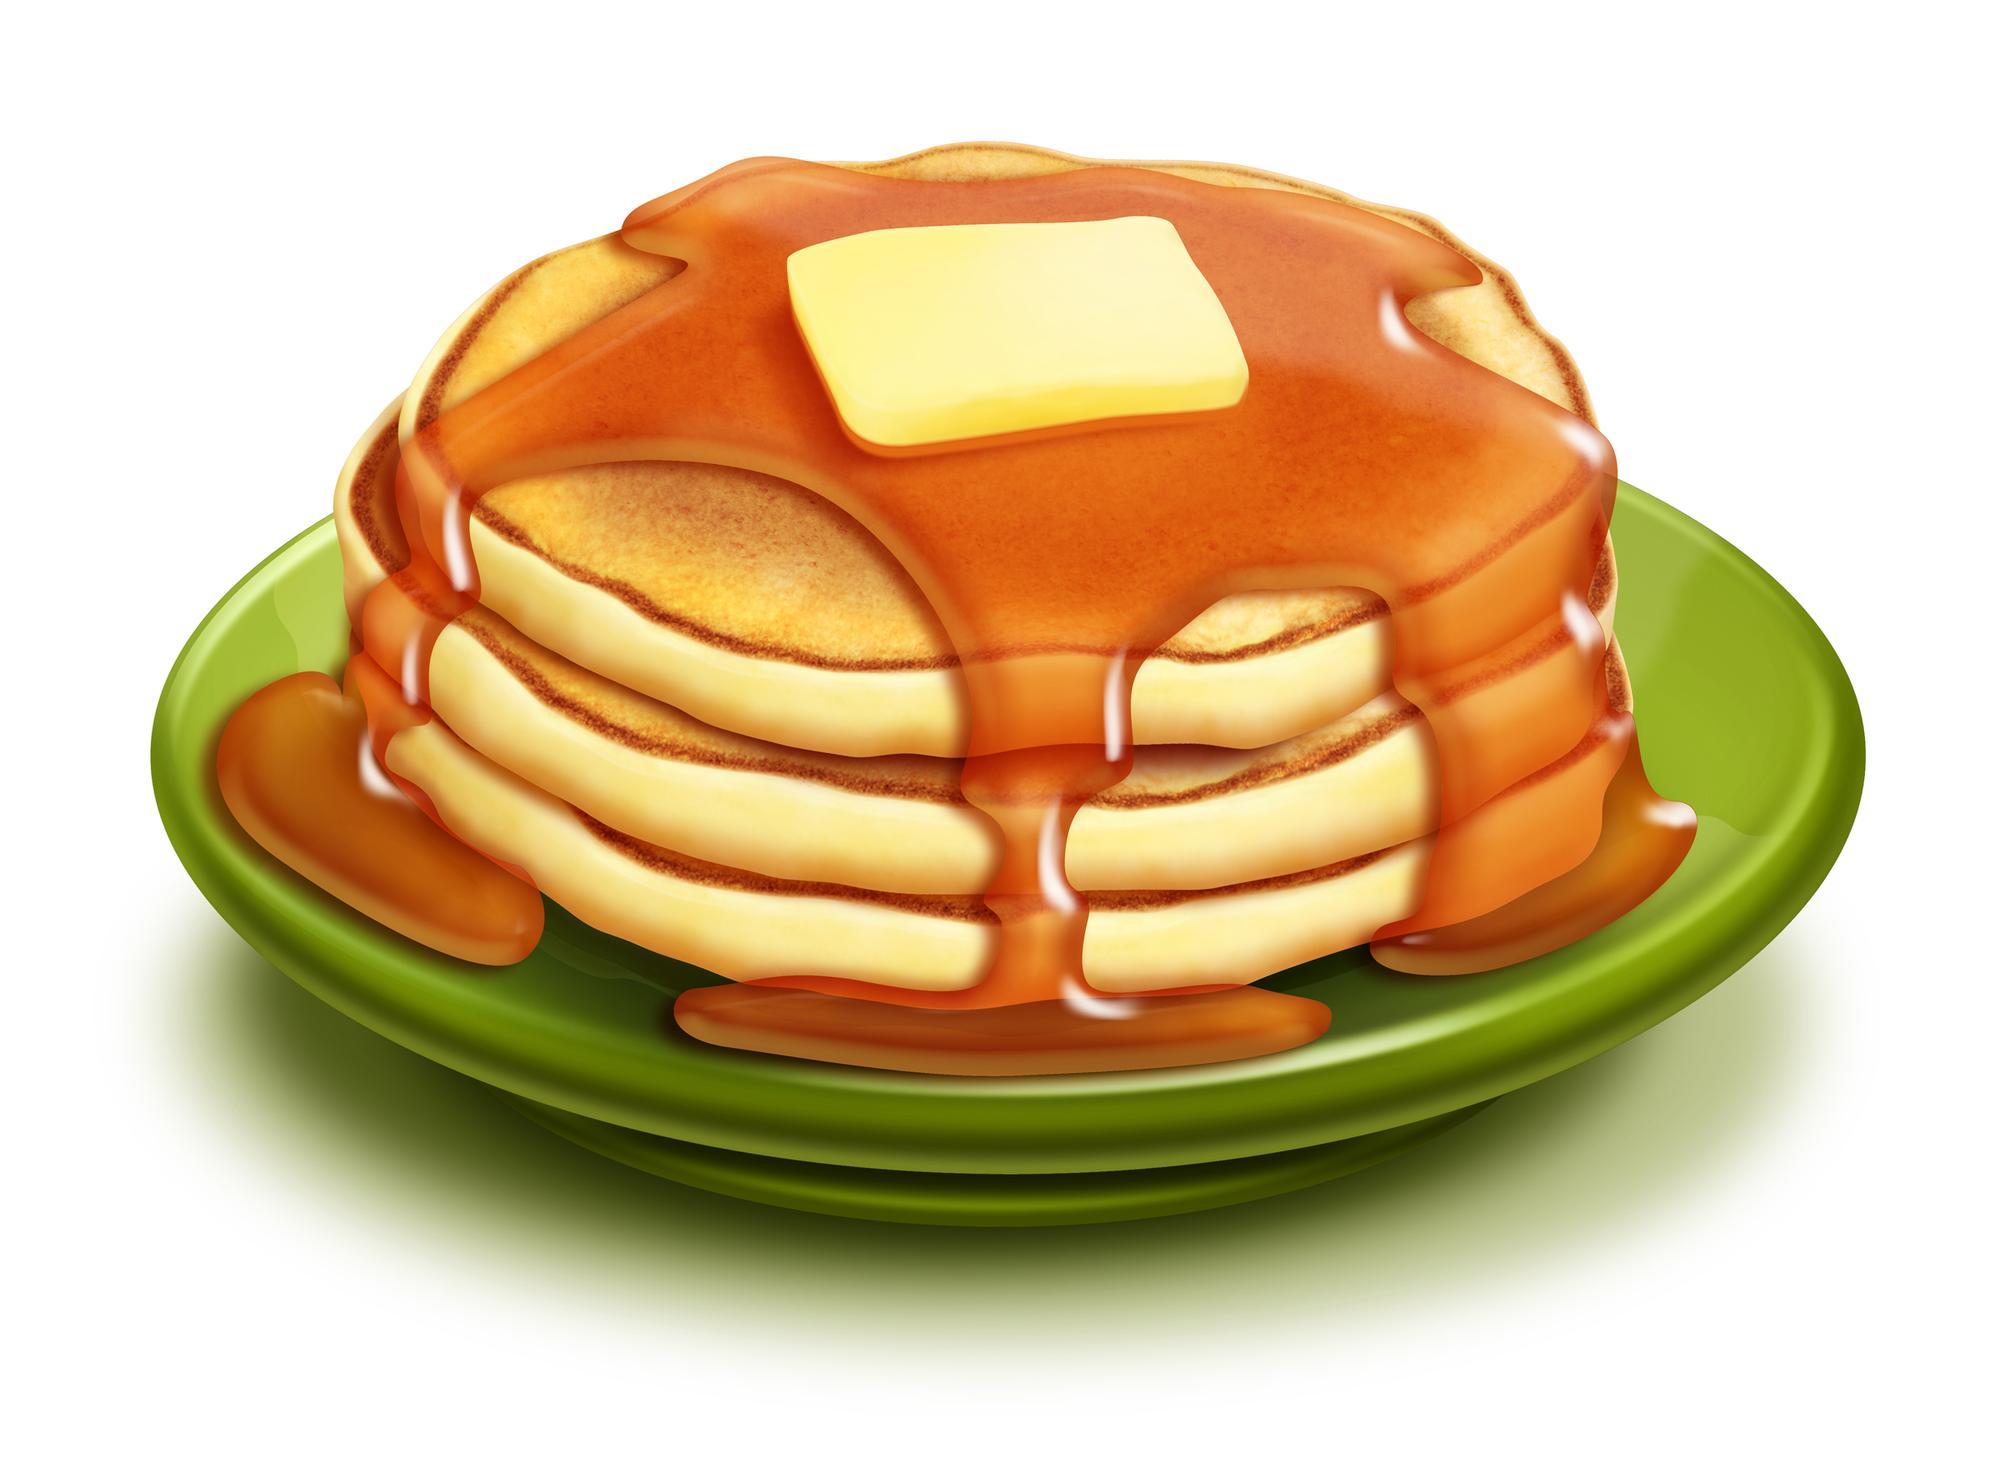 ftc pancake breakfast tickets in elk grove ca united states rh ftc ticketleap com Pancake and Sausage Clip Art Bacon Pancakes Sausage Clip Art